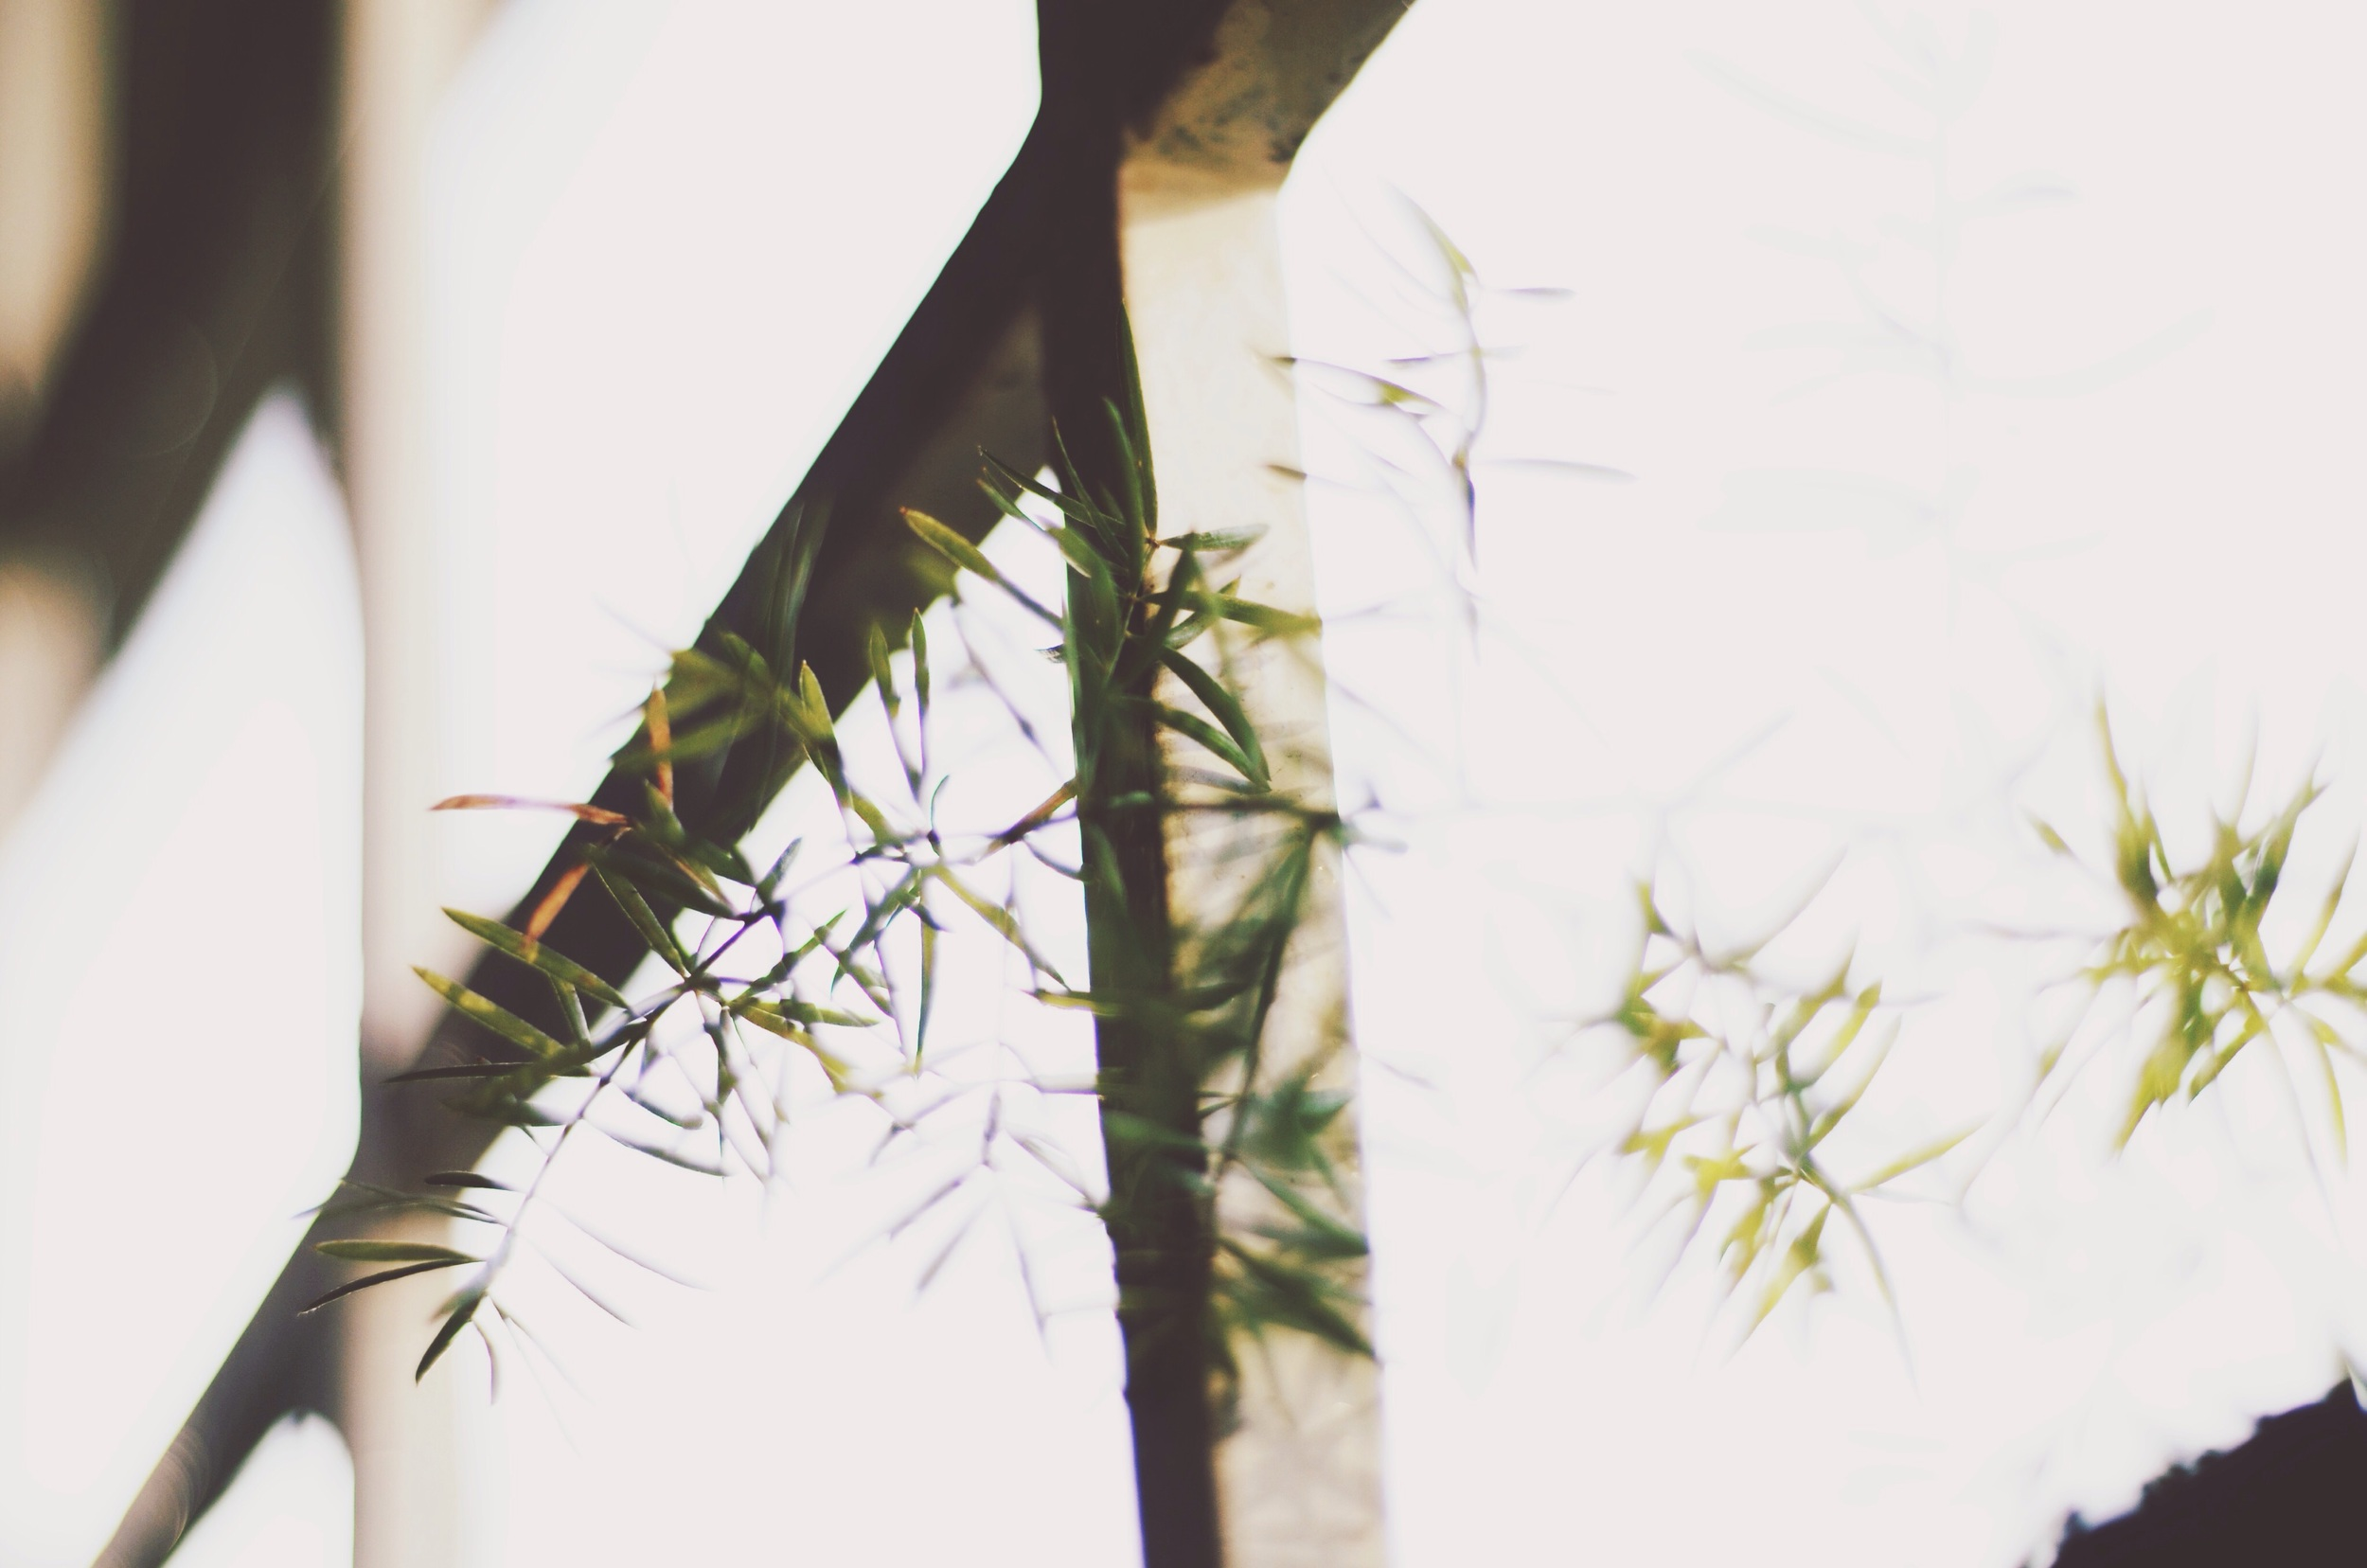 Window plants // 27 may